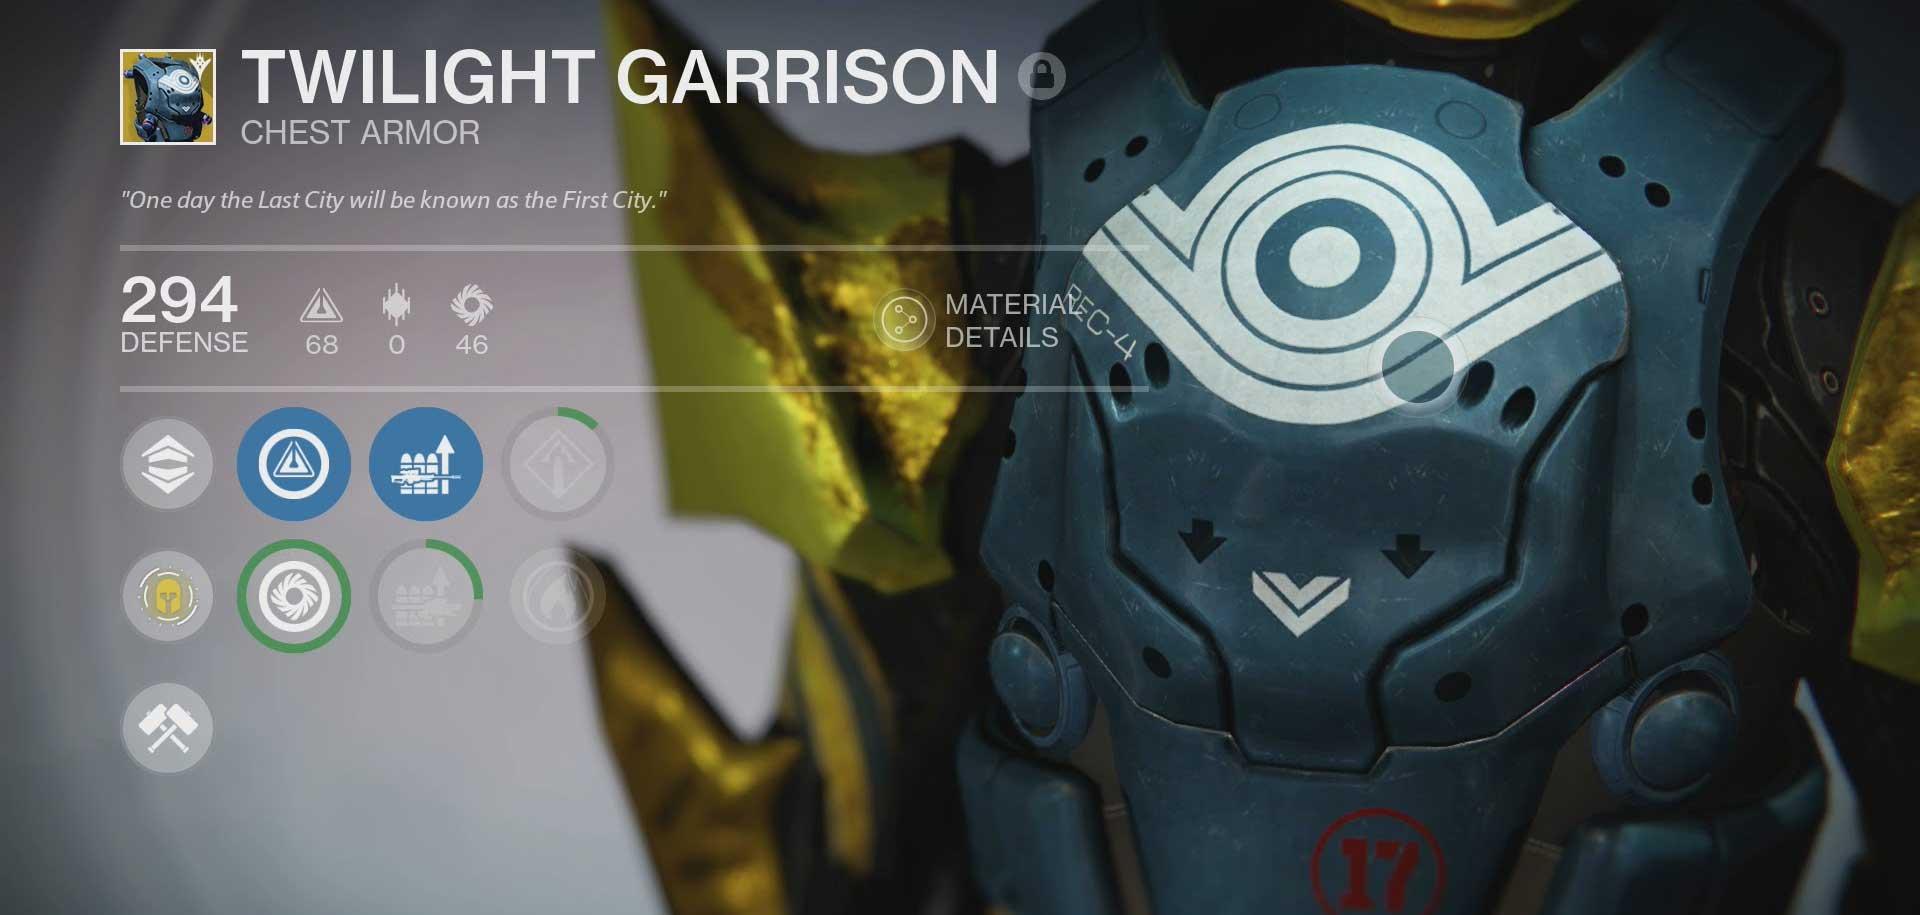 Twilight Garisson